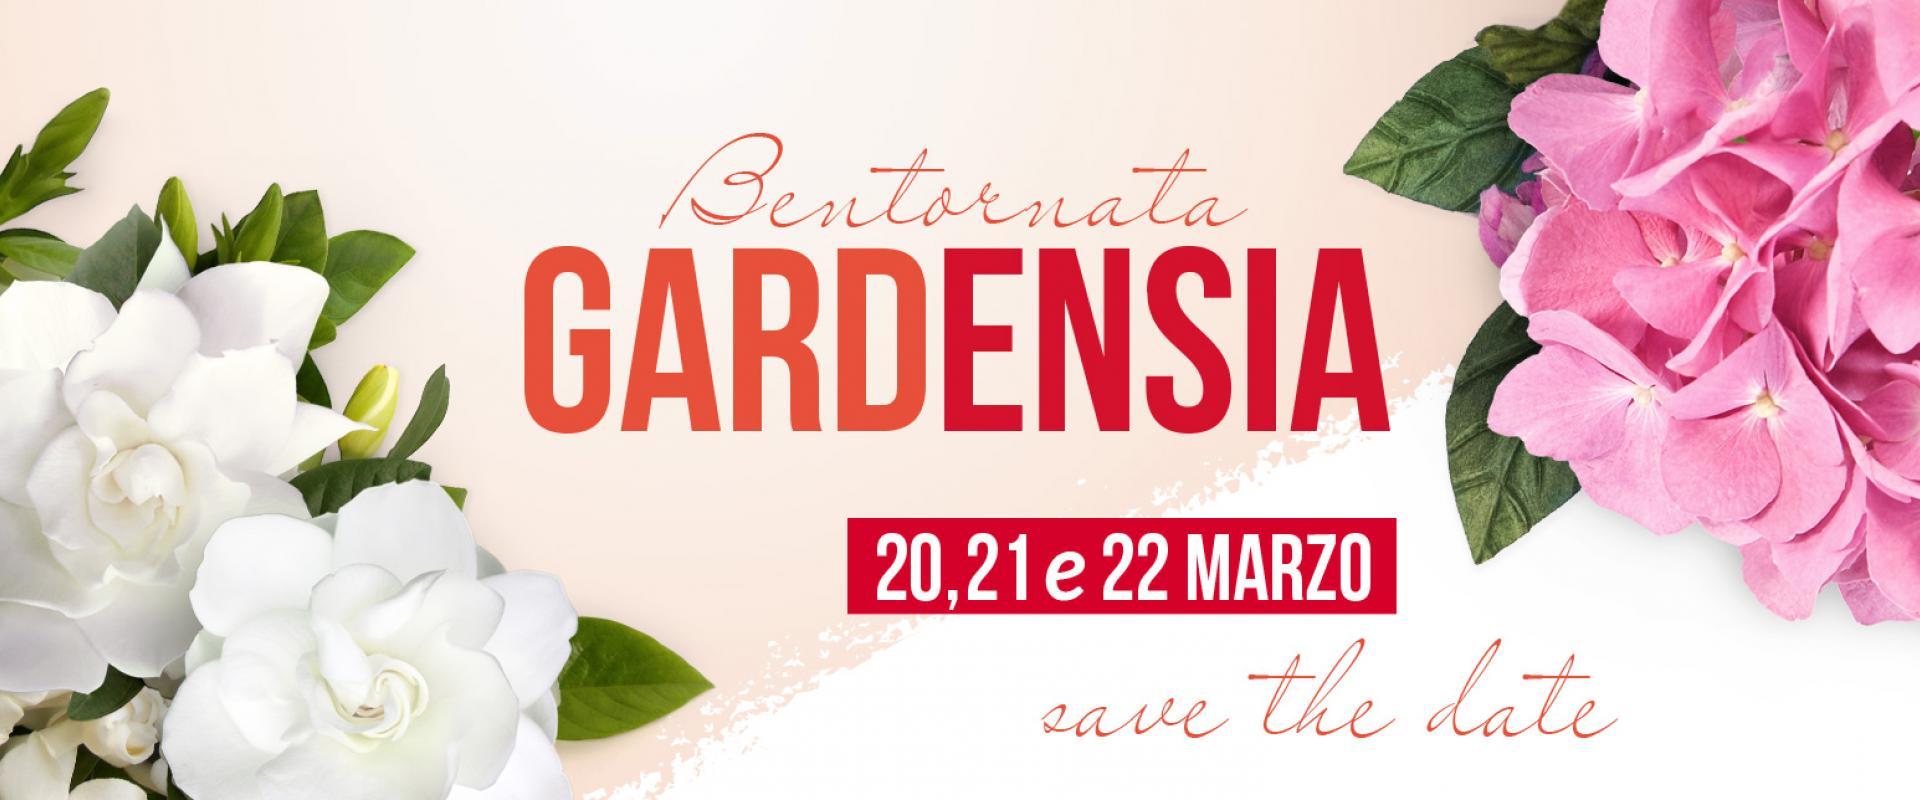 Bentornata Gardensia! 20, 21, 22 marzo 2020 nelle piazze italiane